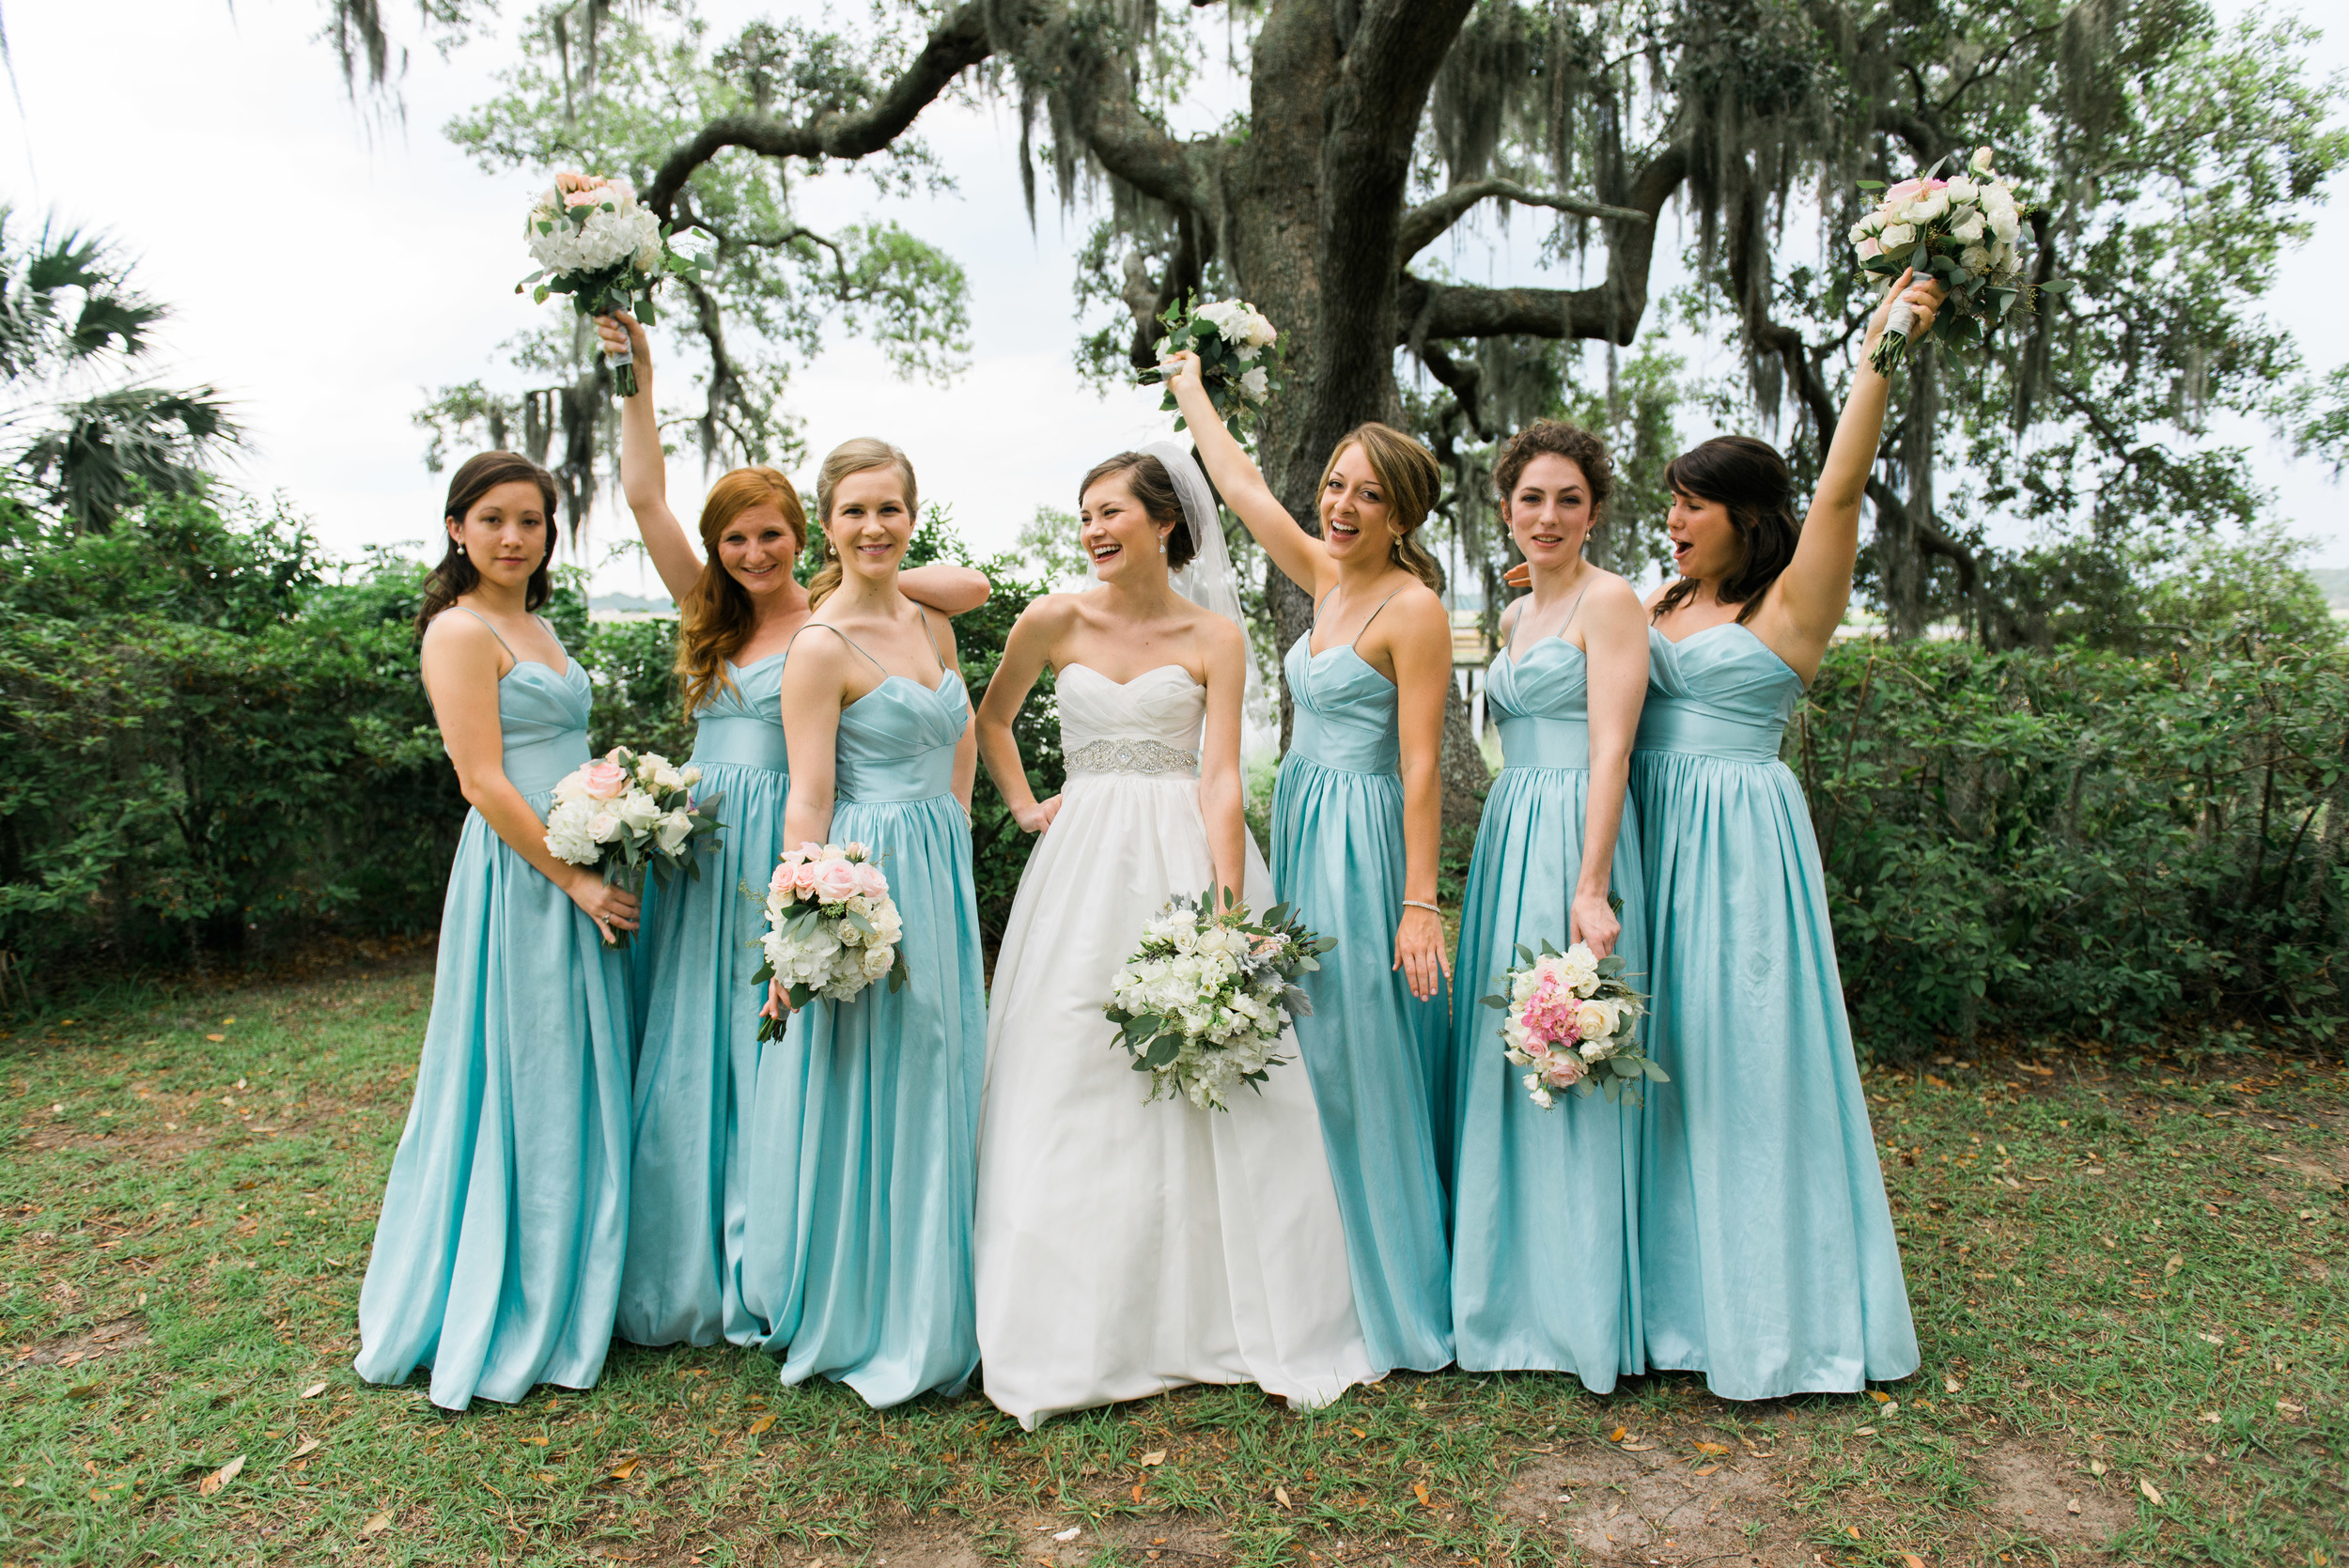 bridesmaids savannah wedding photographer